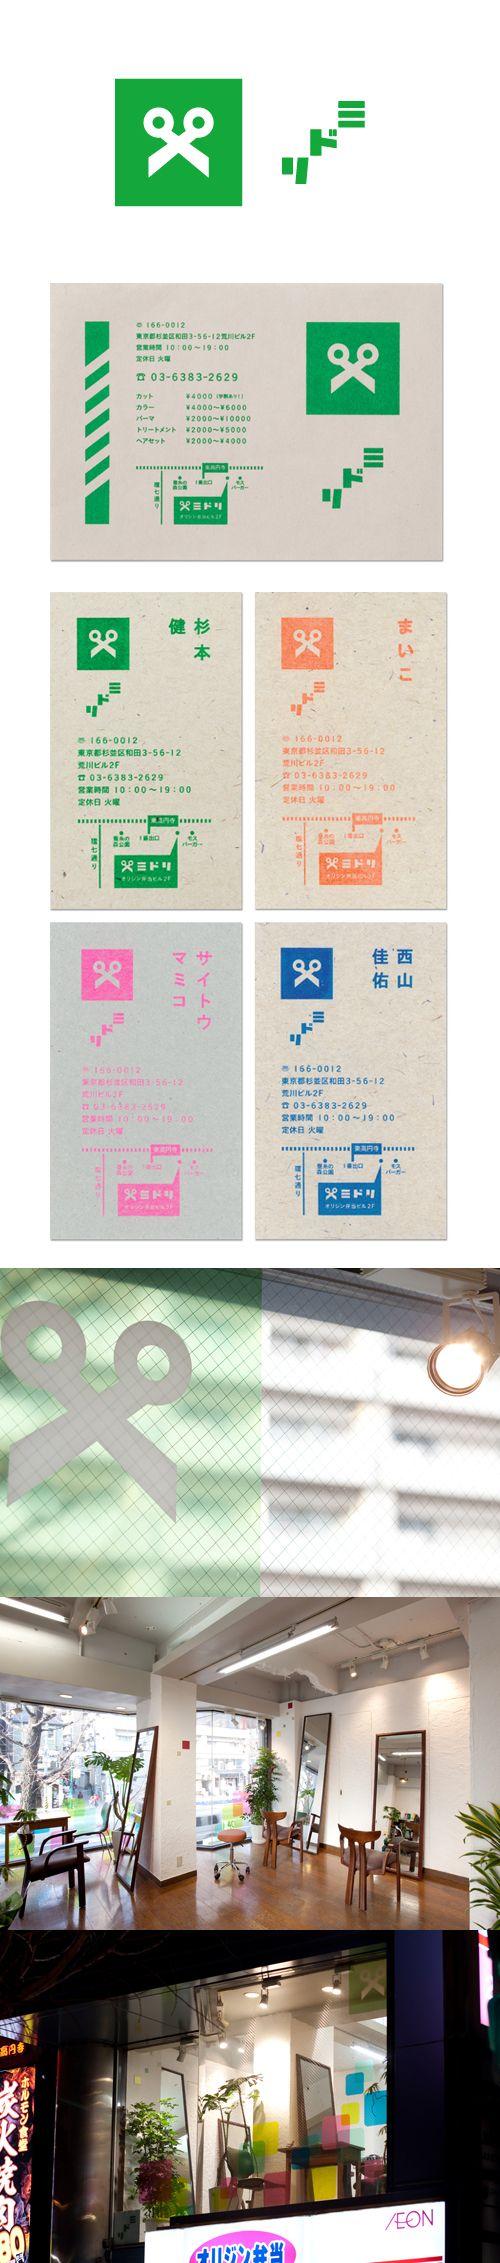 midori / hair salon / logo / DM / name card / sign / FROM GRAPHIC